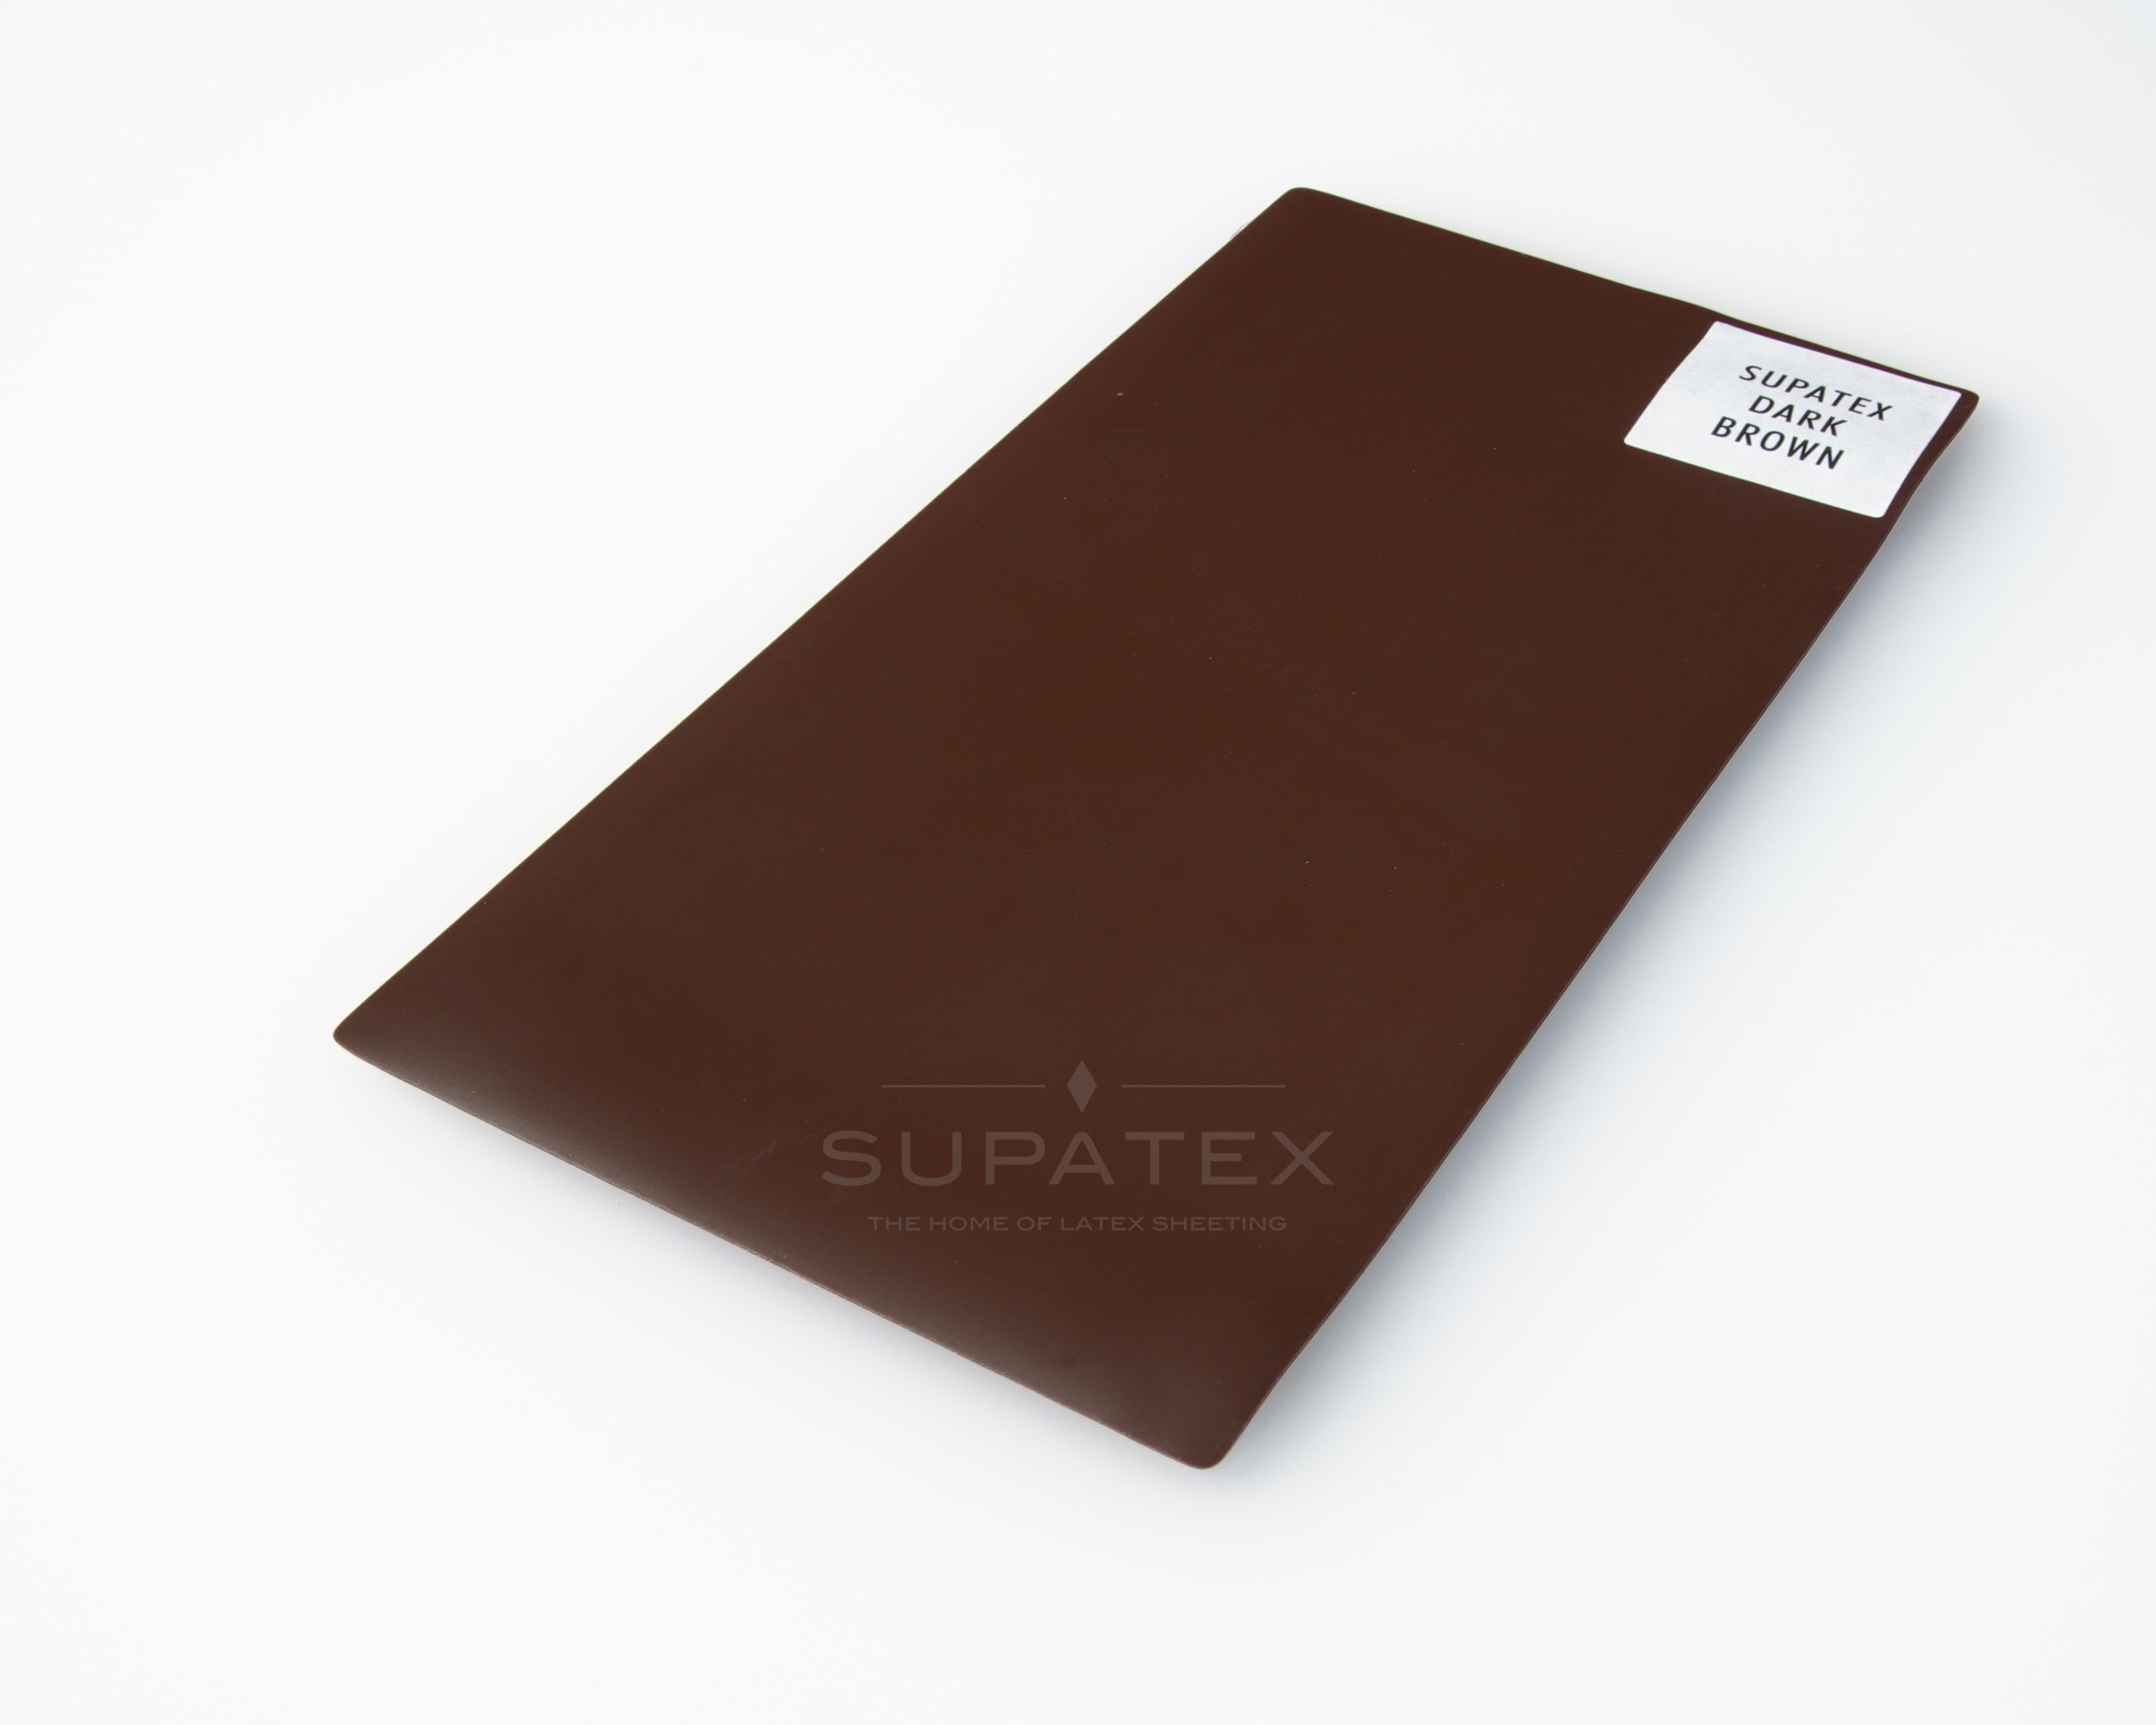 Supatex Dark Brown 0.33 mm